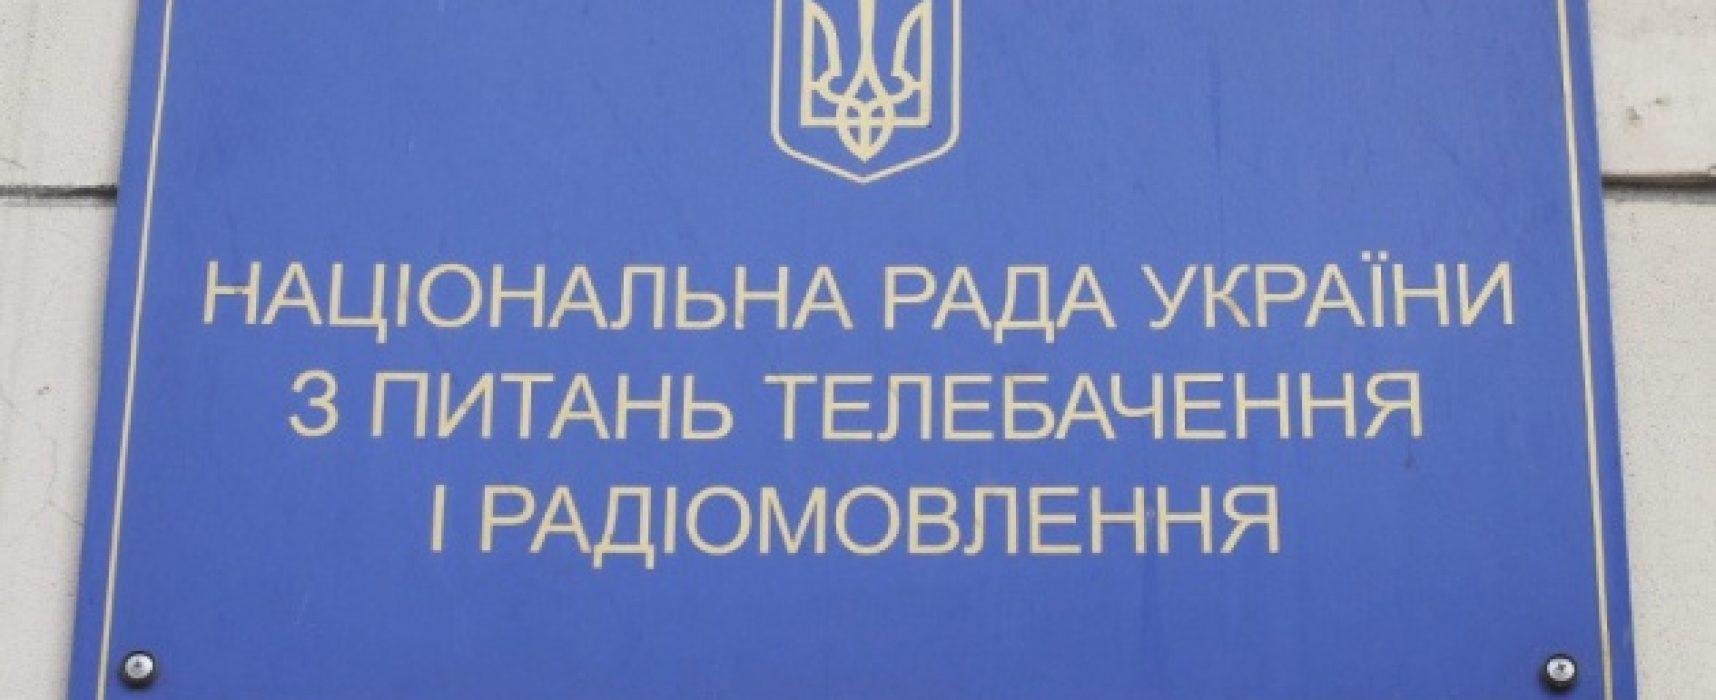 Нацсовет проверит «NewsOne» и «112 Украина» за пиар встречи Медведчука с Путиным